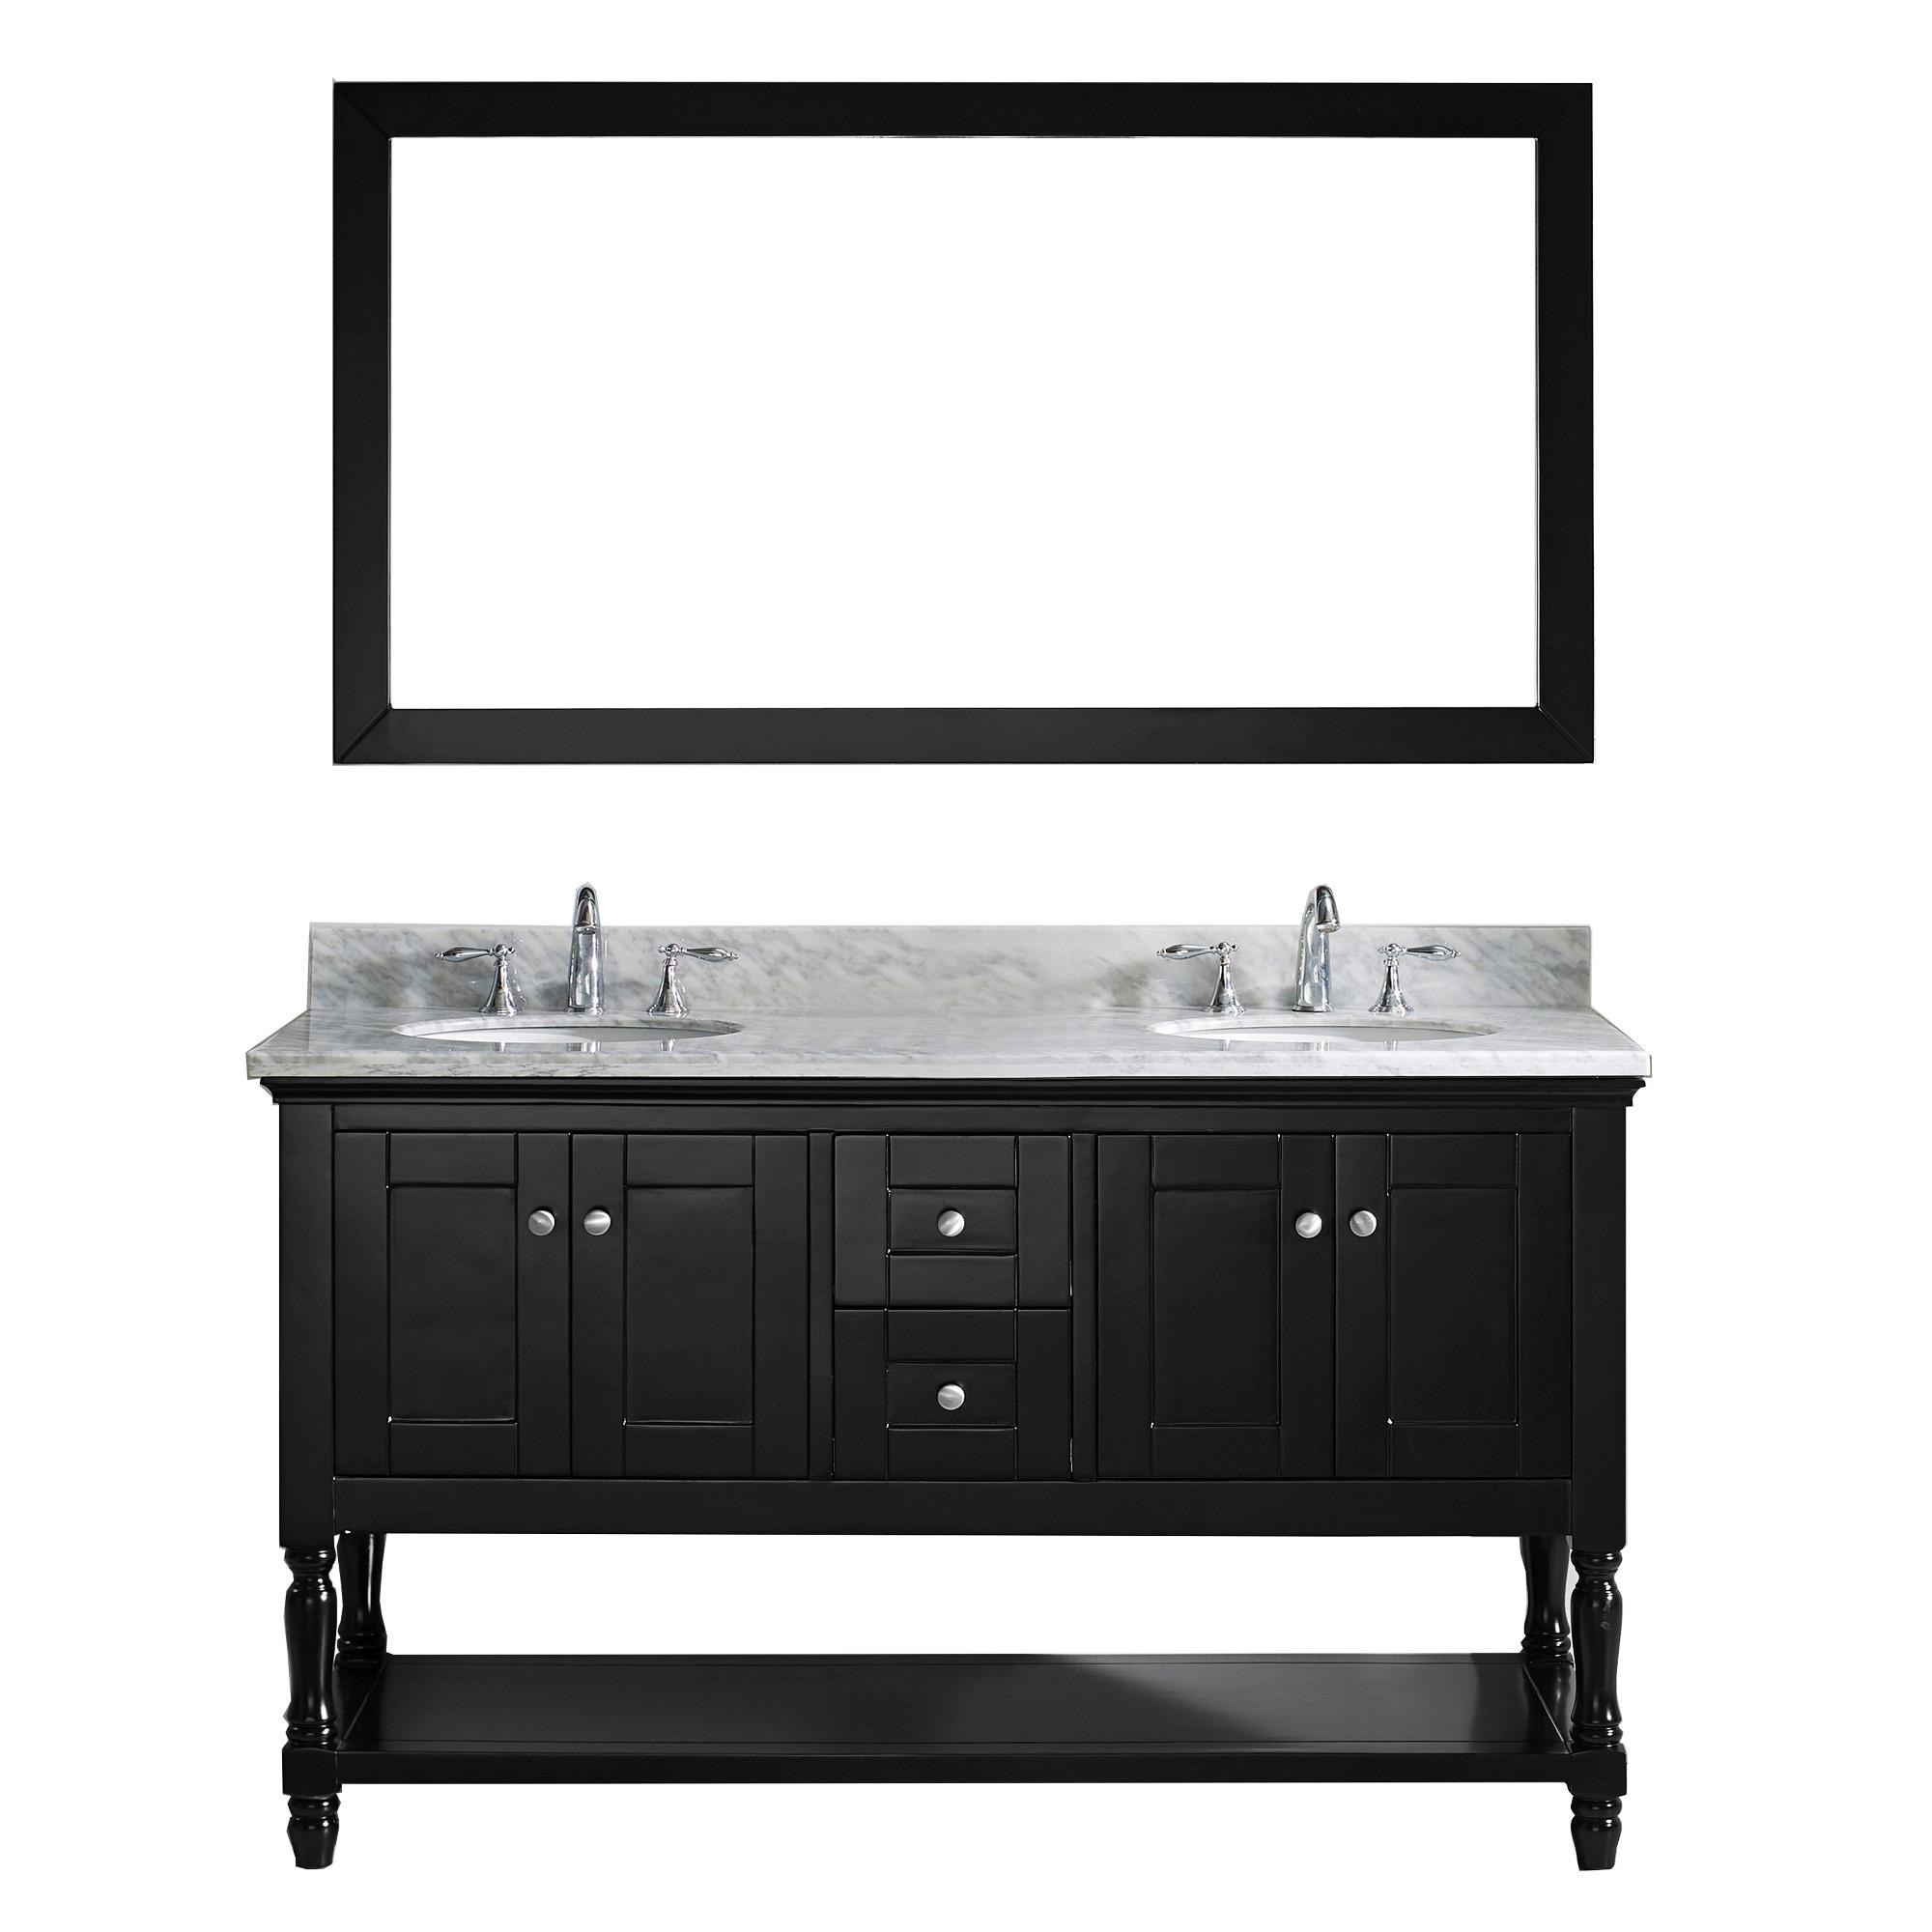 "Virtu MD-3160-WMRO Julianna Espresso 60"" Double Bath Vanity Cabinet Set"